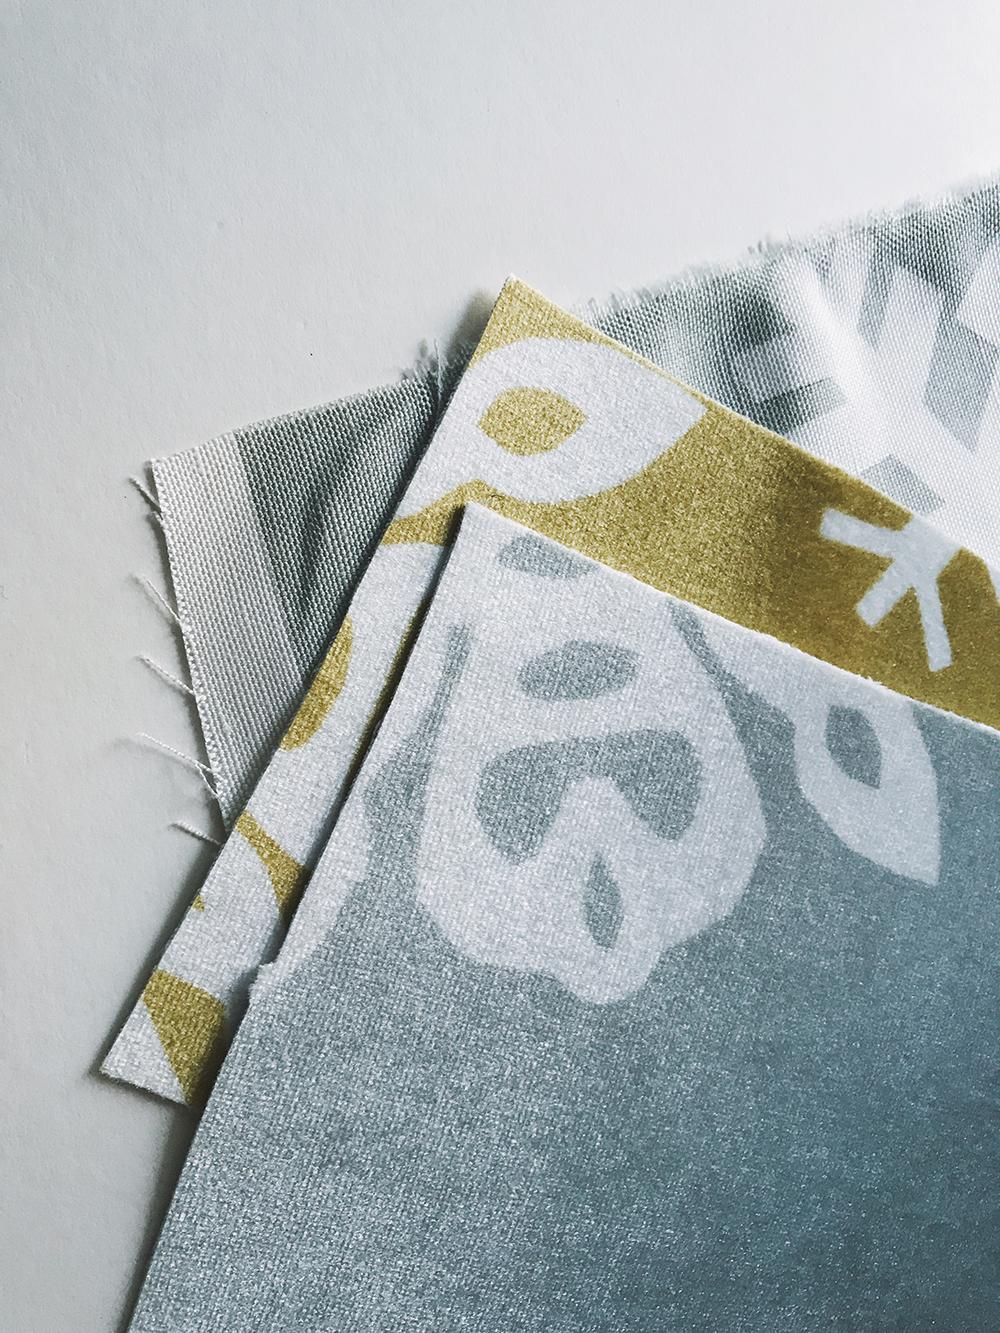 Velvet and linen cotton canvas fabric samples | Spoonflower Blog